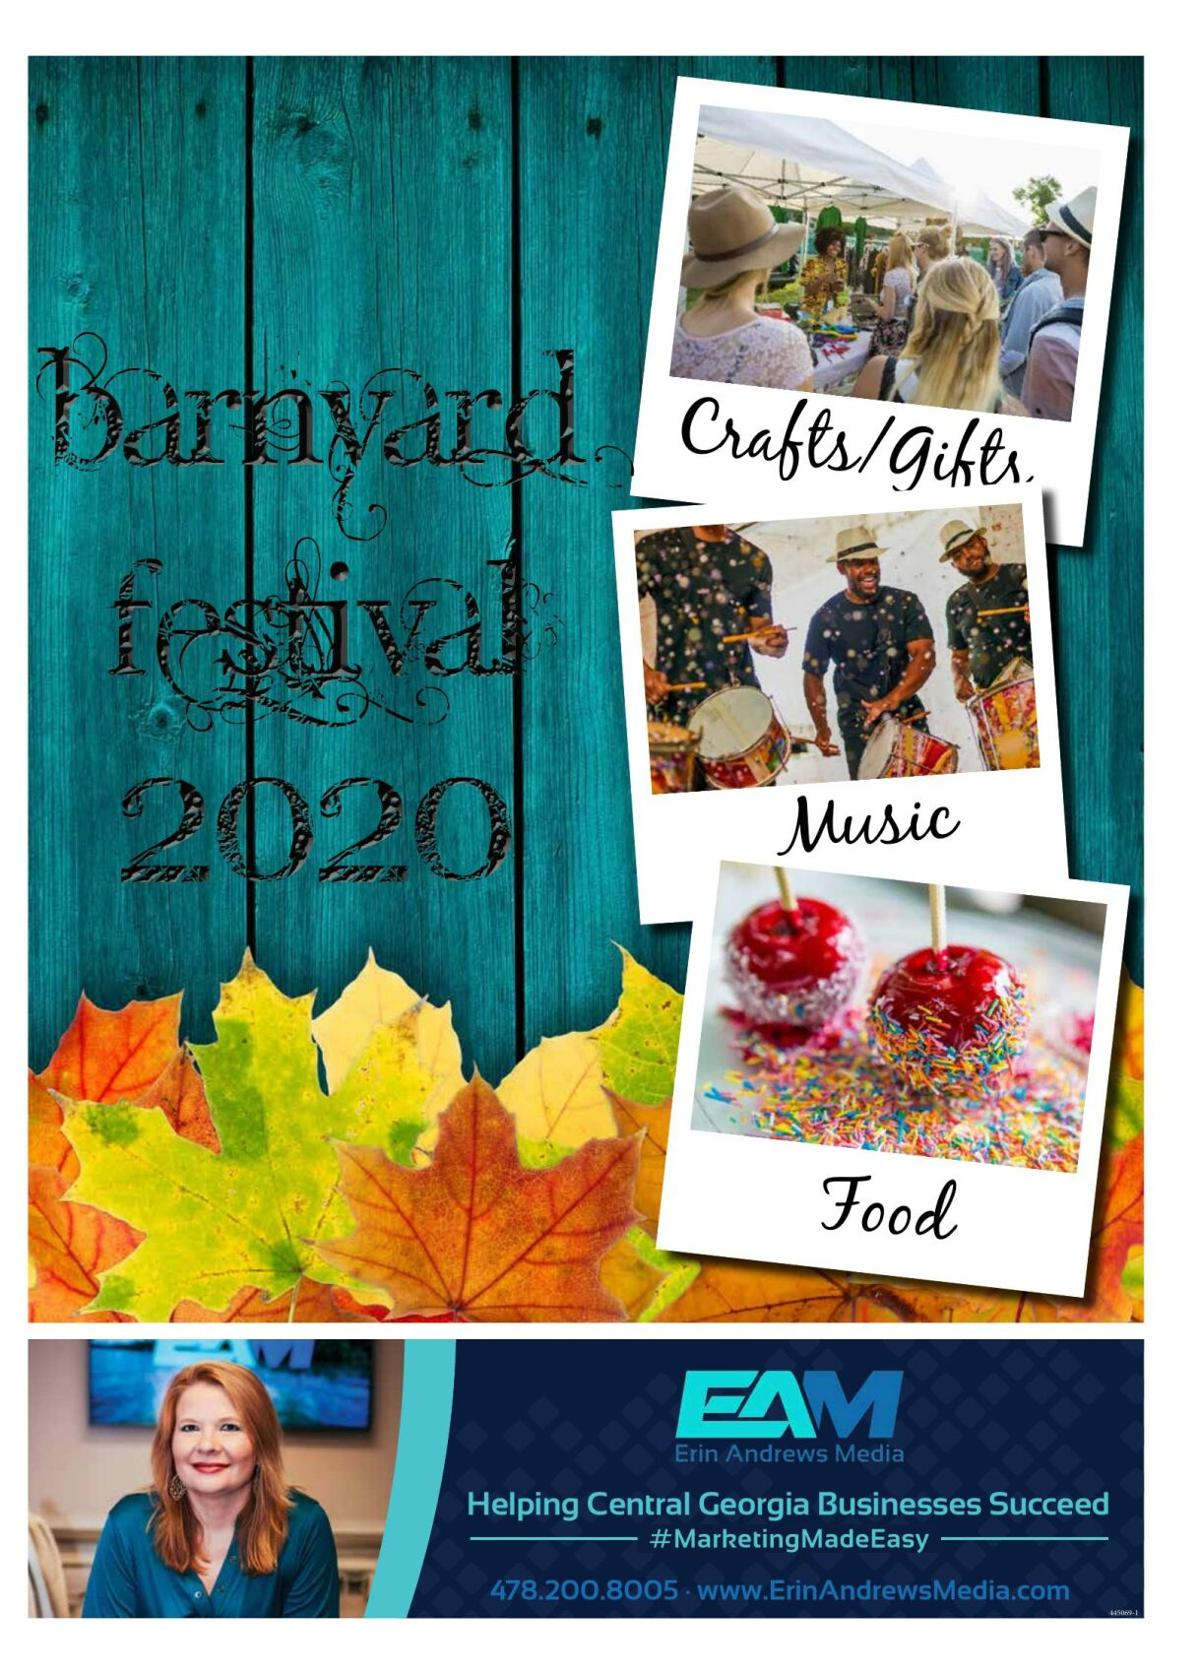 Barnyard Festival